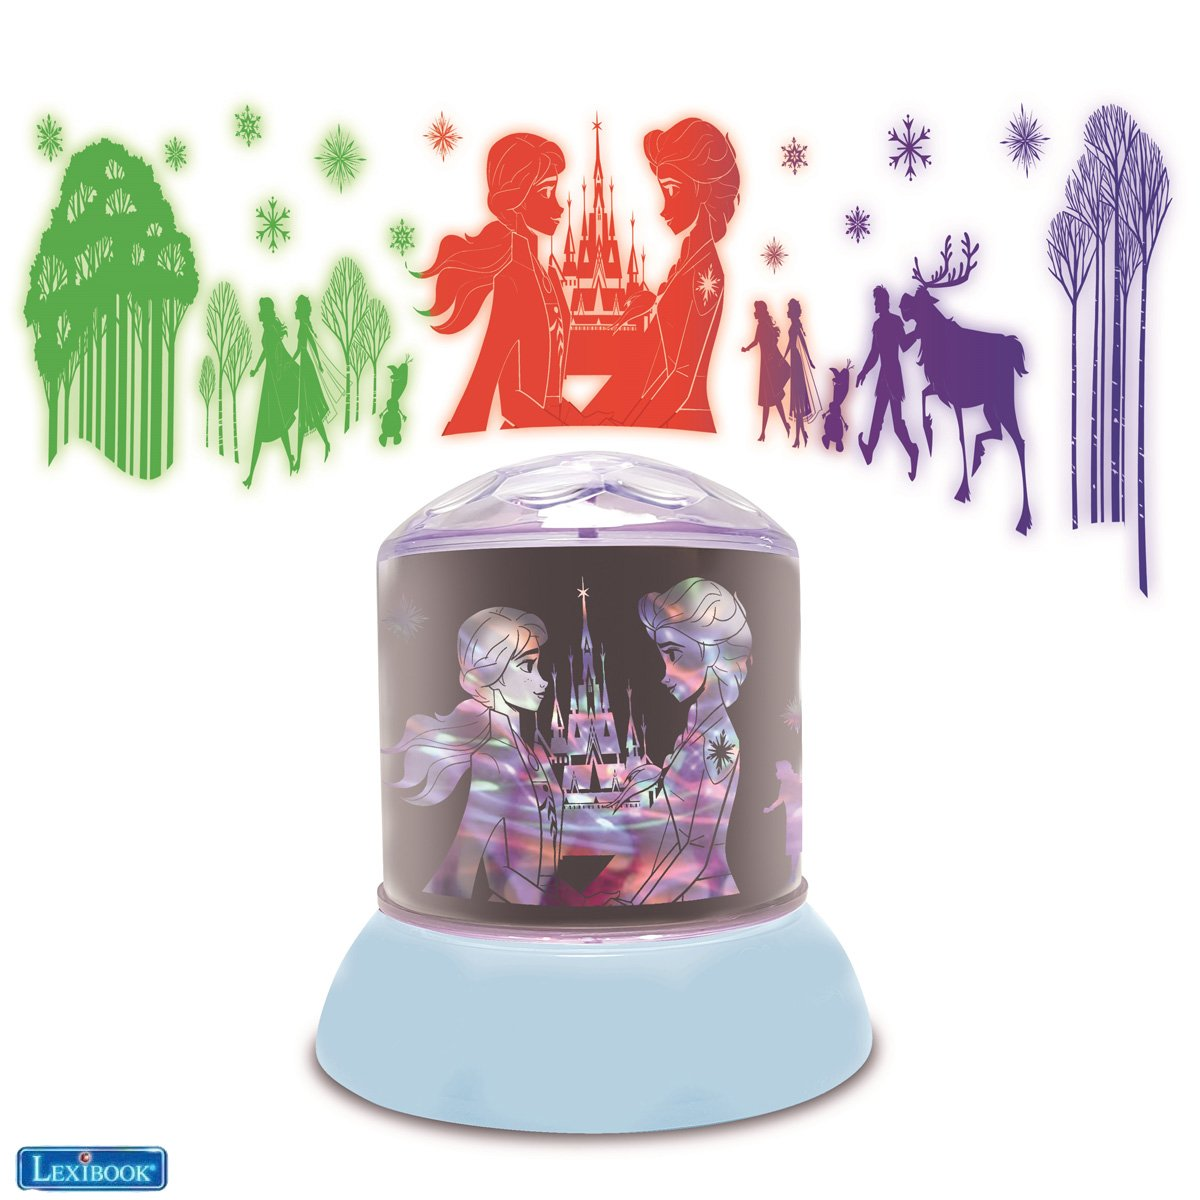 Lexibook - Disney Frozen Ceiling Projector Rotative Night Light (NLJ030FZ)